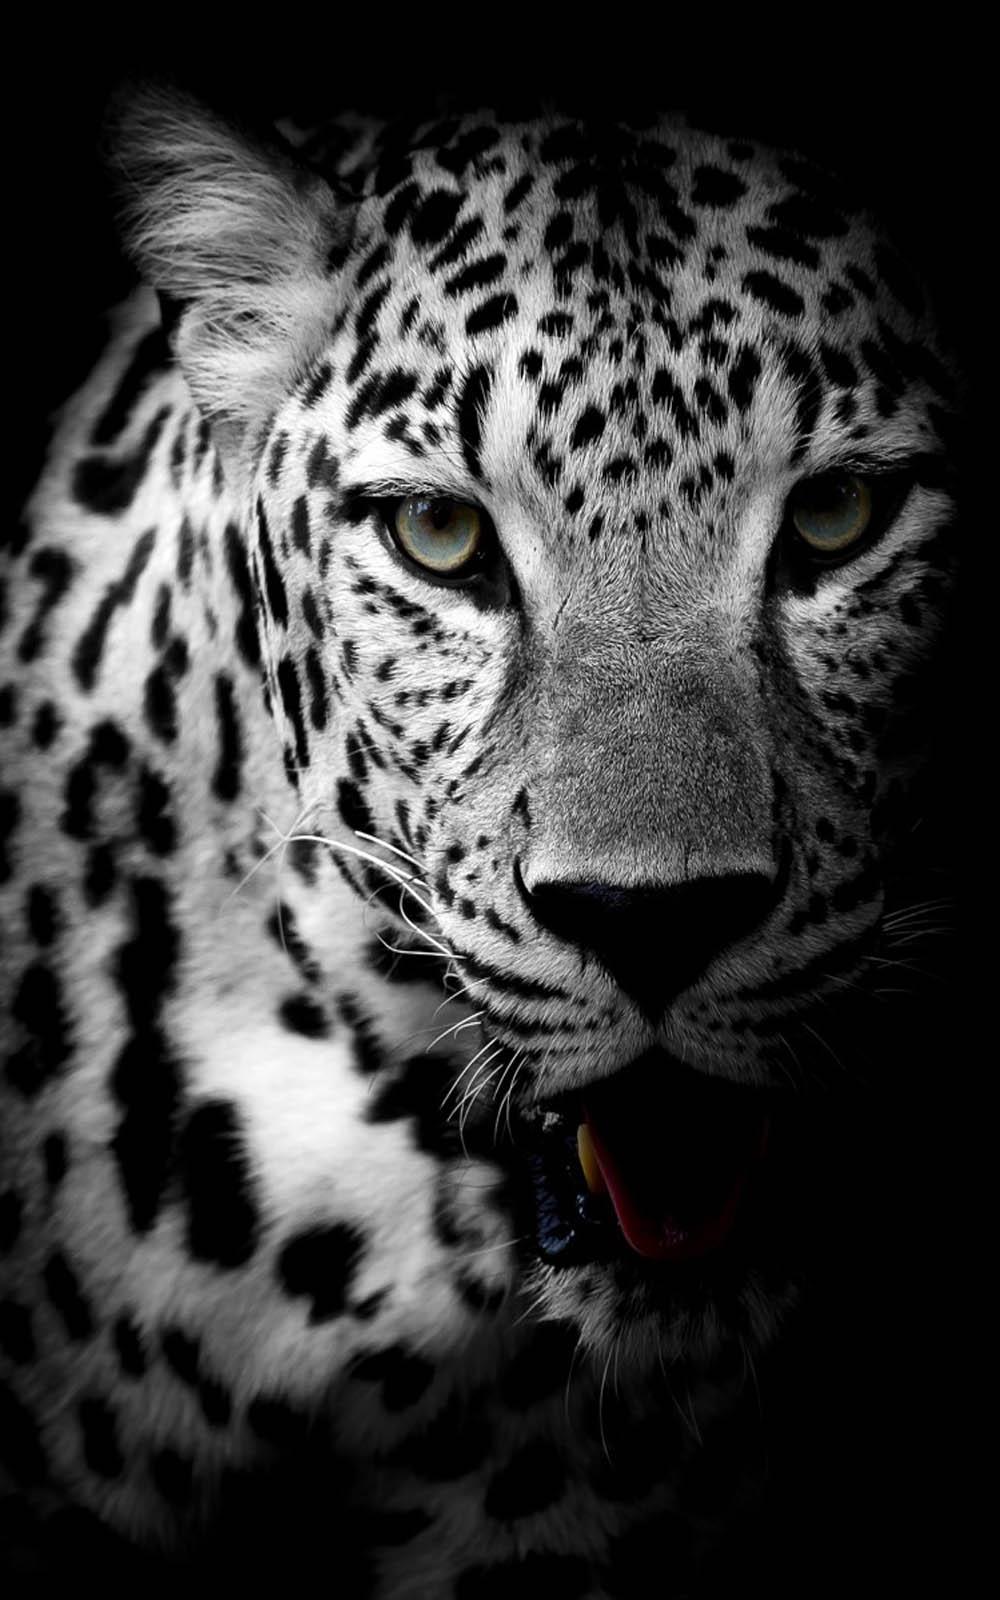 Leopard Black White 4k Ultra Hd Mobile Wallpaper